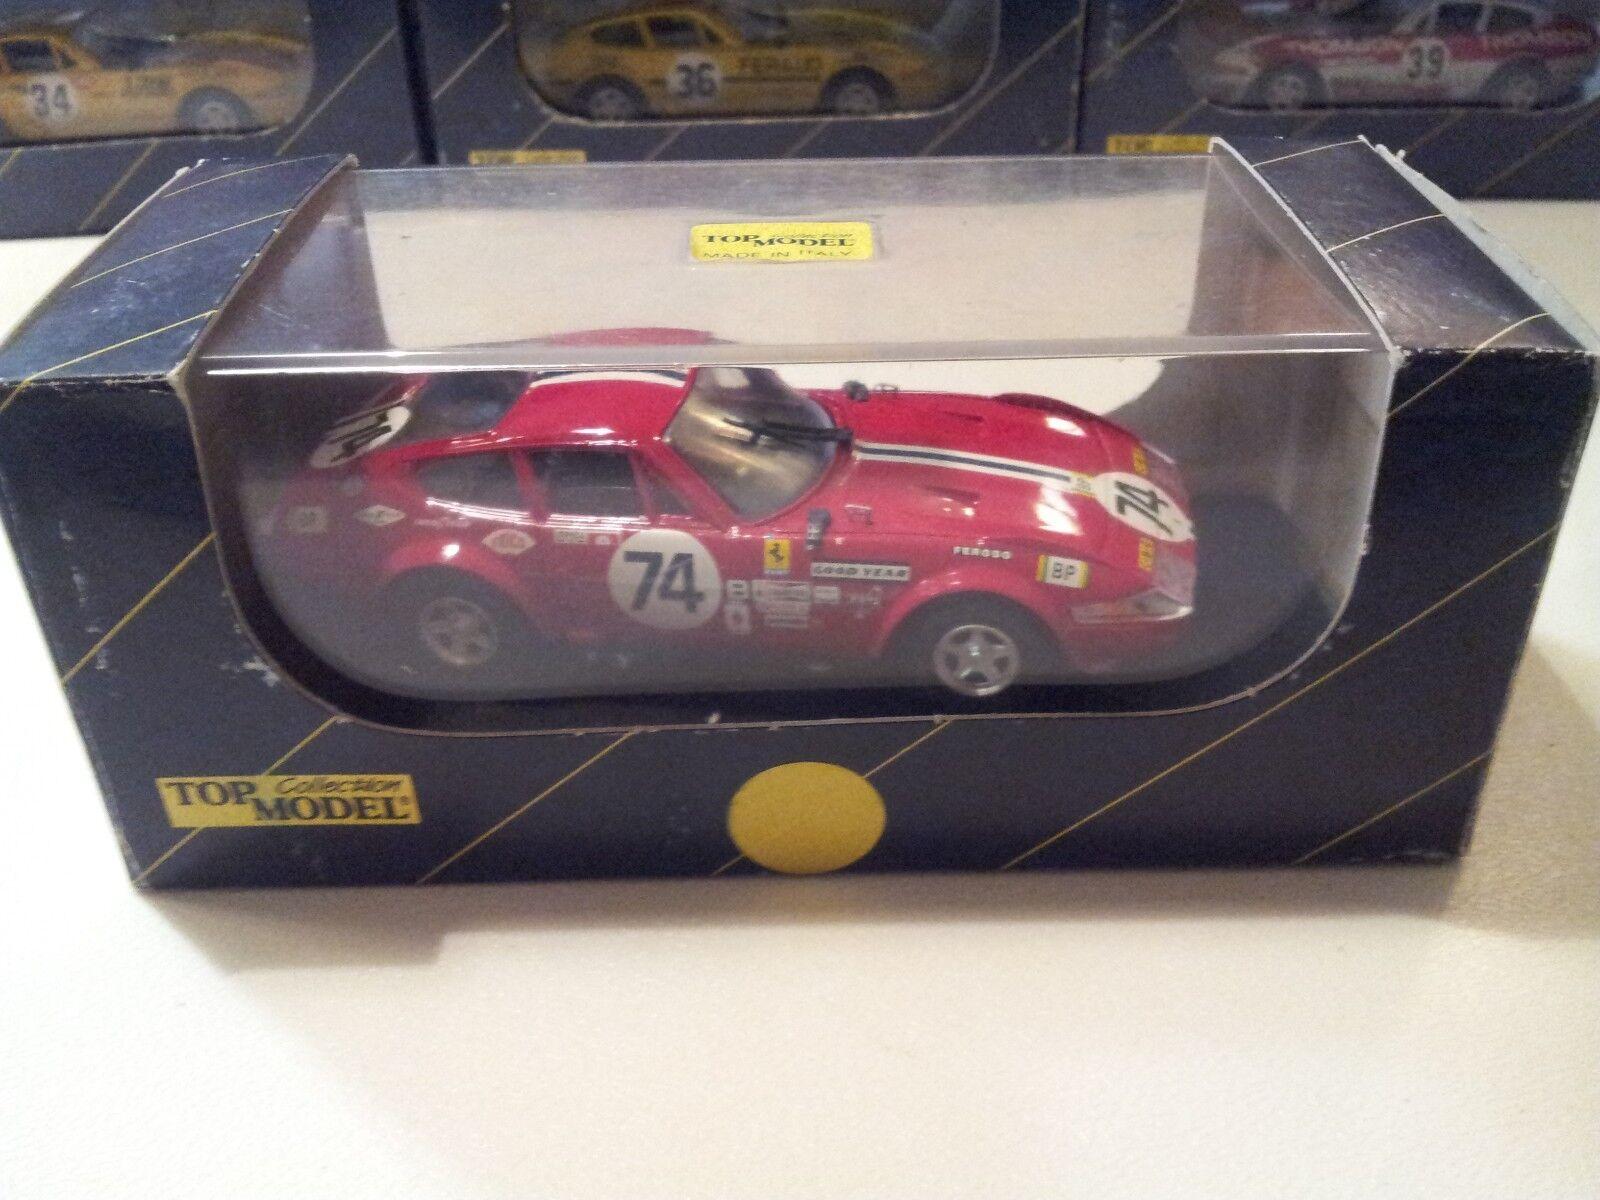 TOP MODEL Ferrari 365 GTB4 Daytona LeMans 1972 model 1 43 scale (Made in )